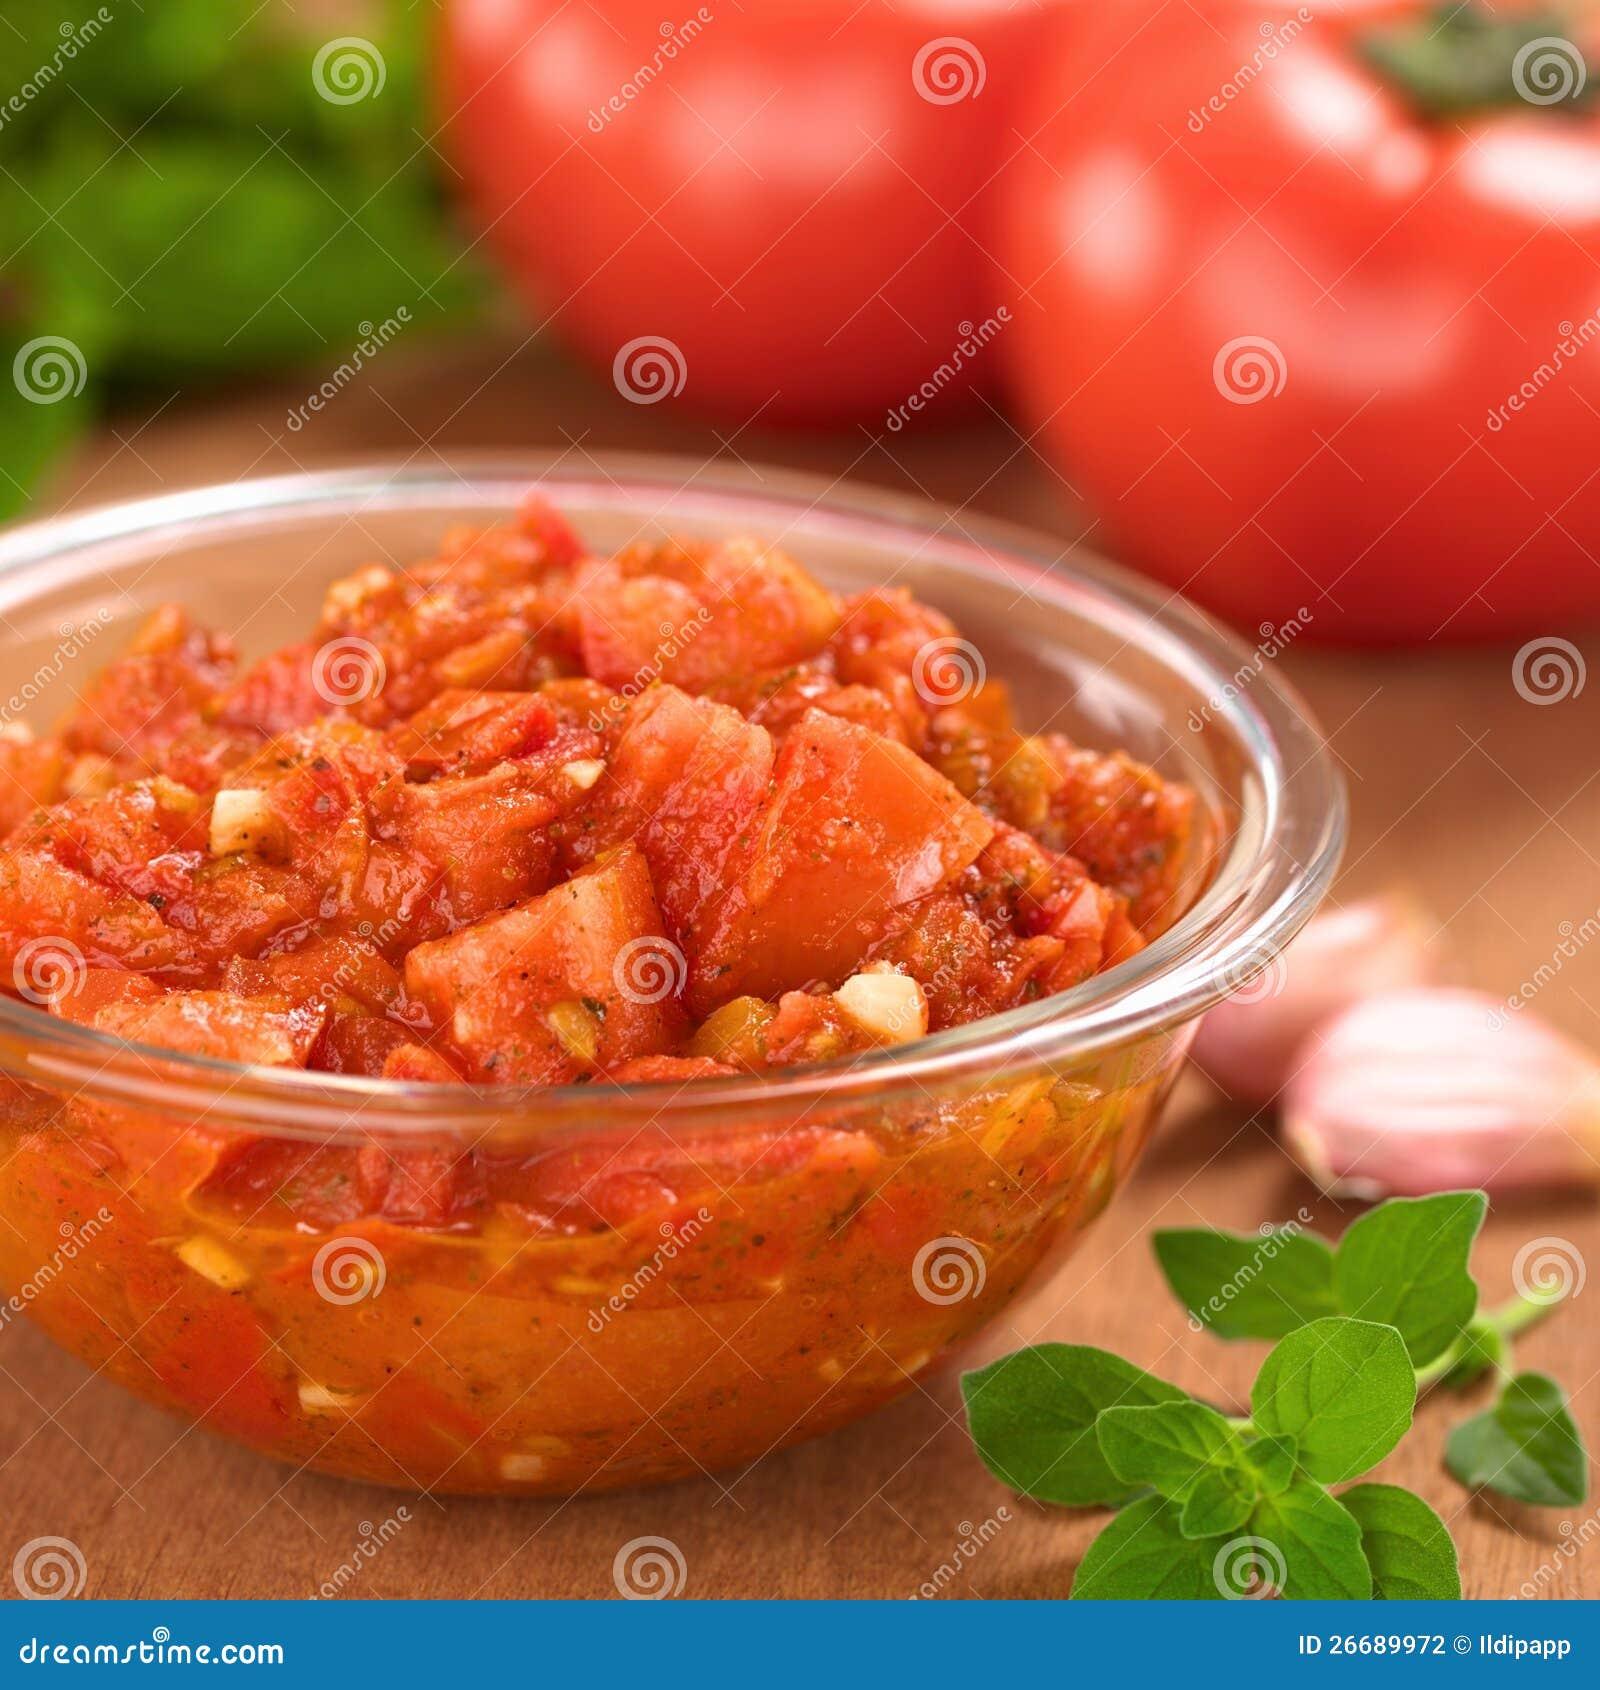 Homemade Tomato Sauce Stock Photography Image 26689972